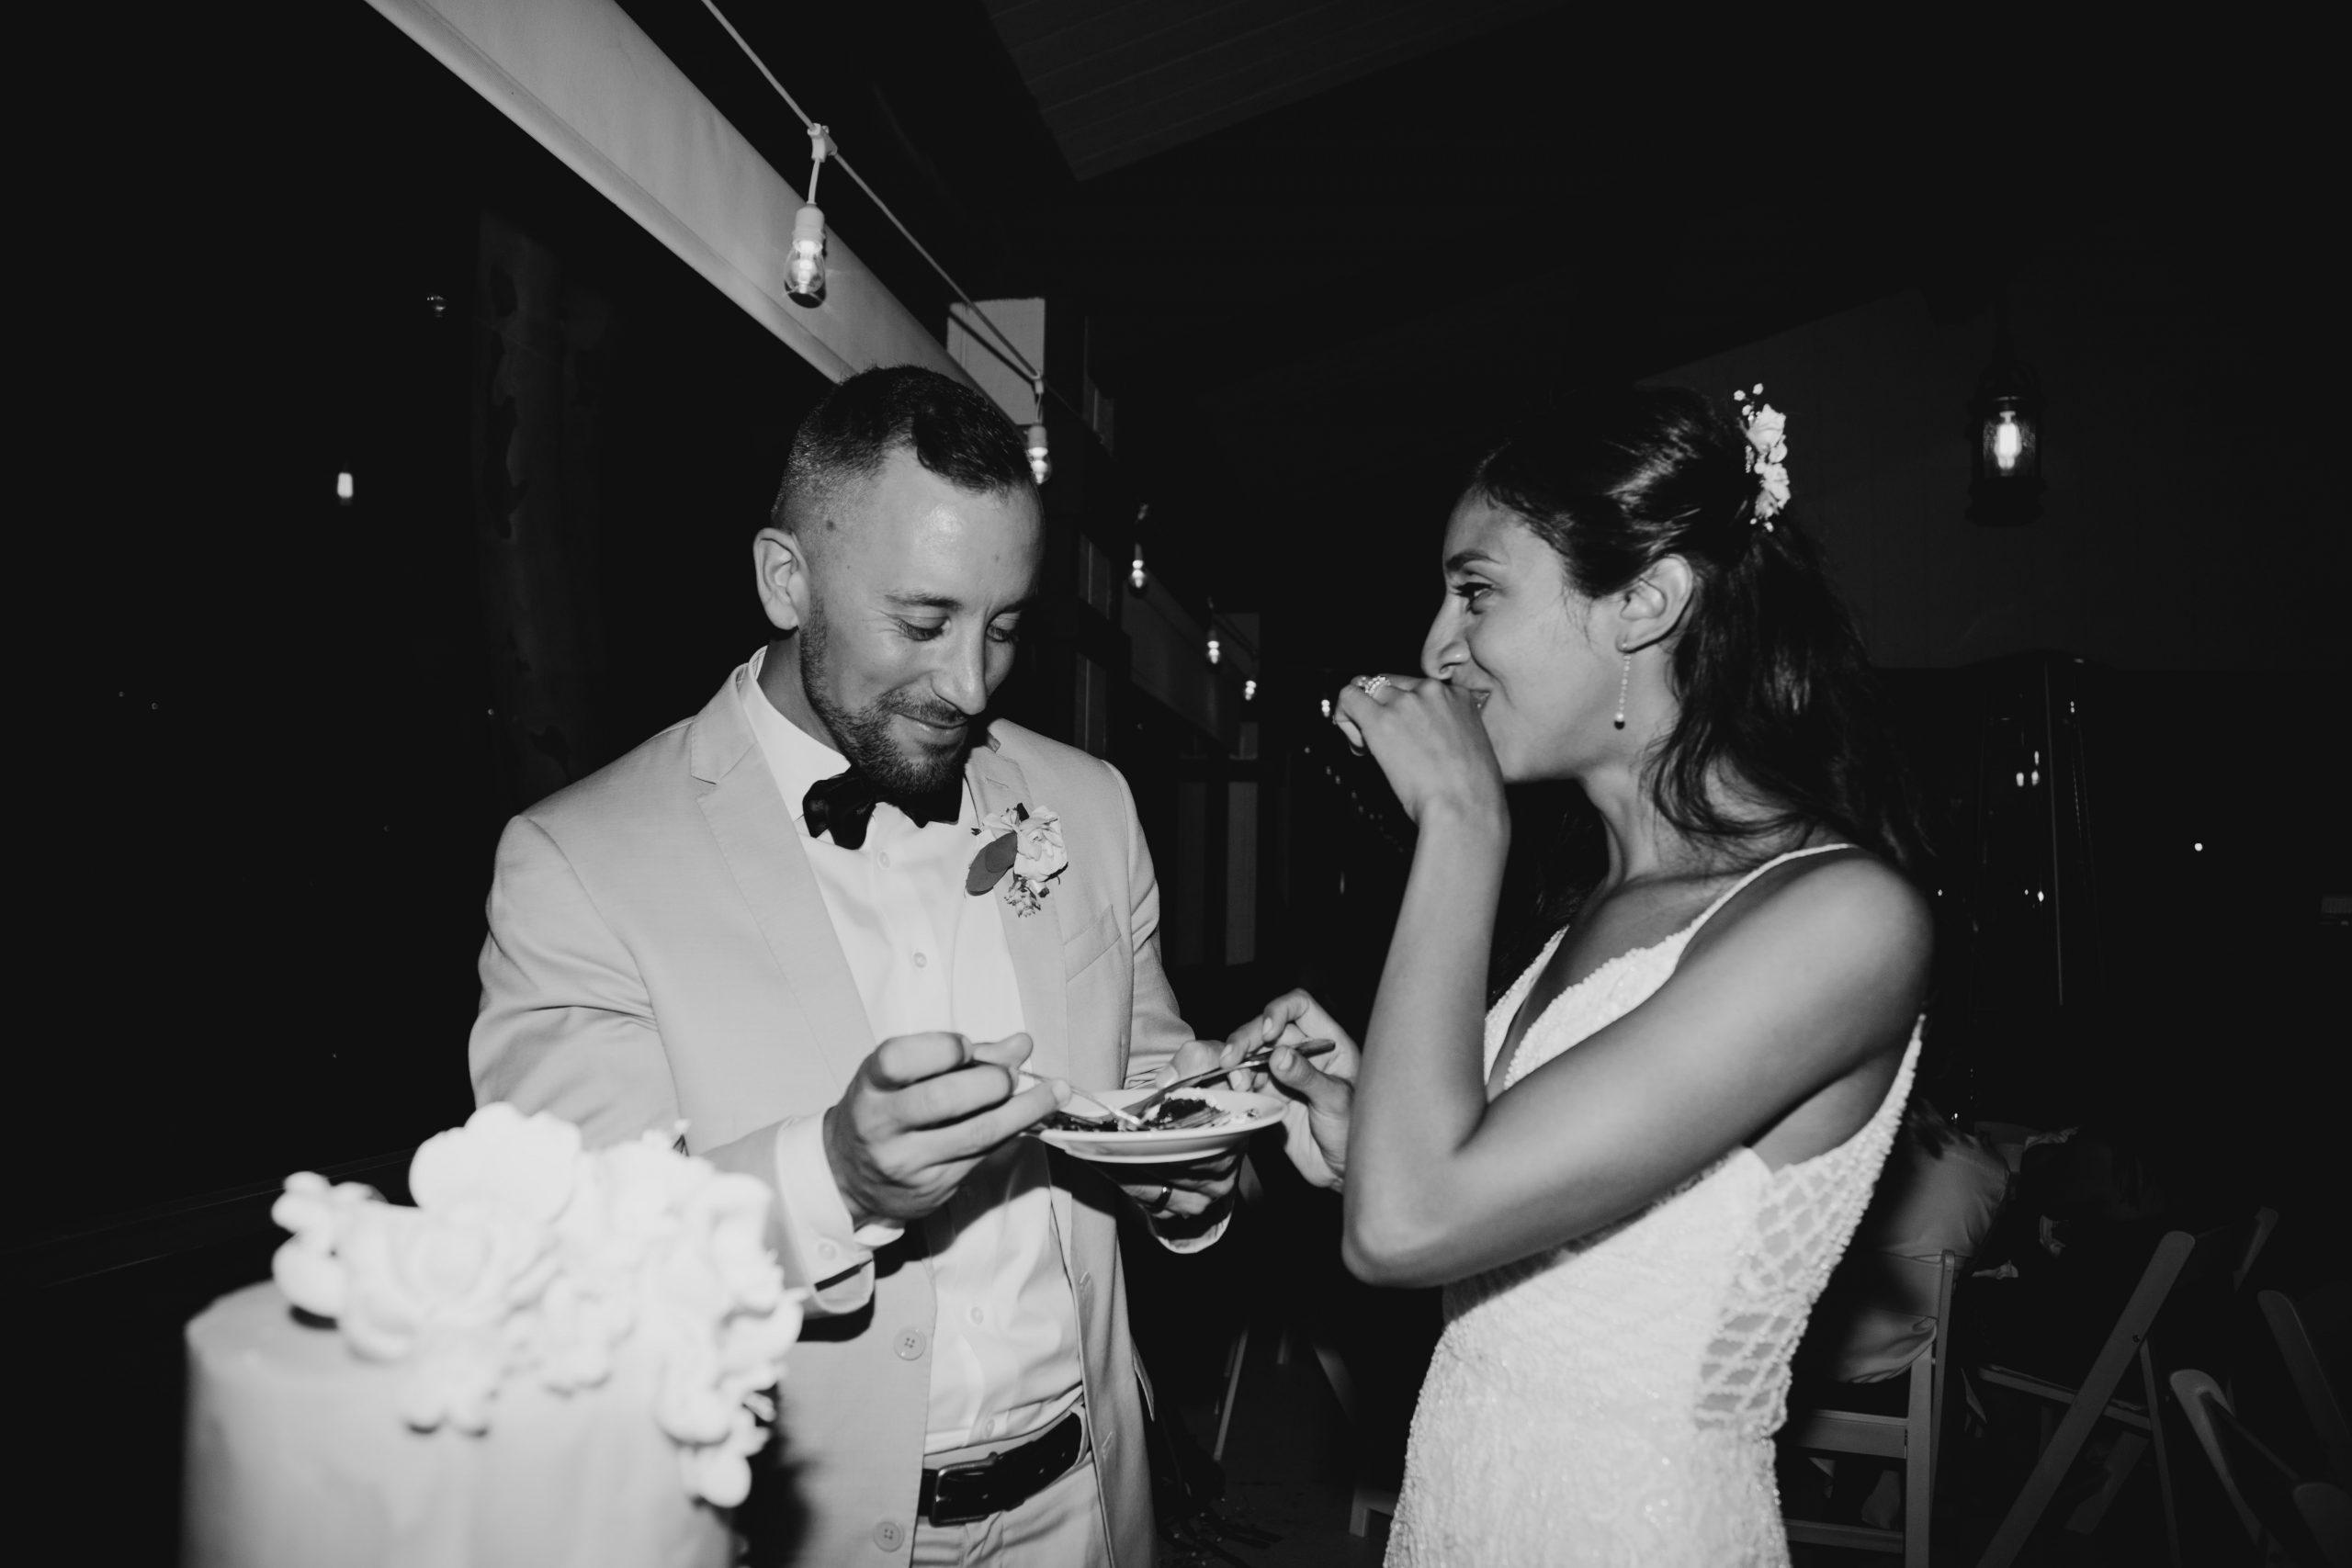 Bride and Groom cut cake, The Montage Laguna Beach Wedding Bridal Portraits, image by Fatima Elreda Photo